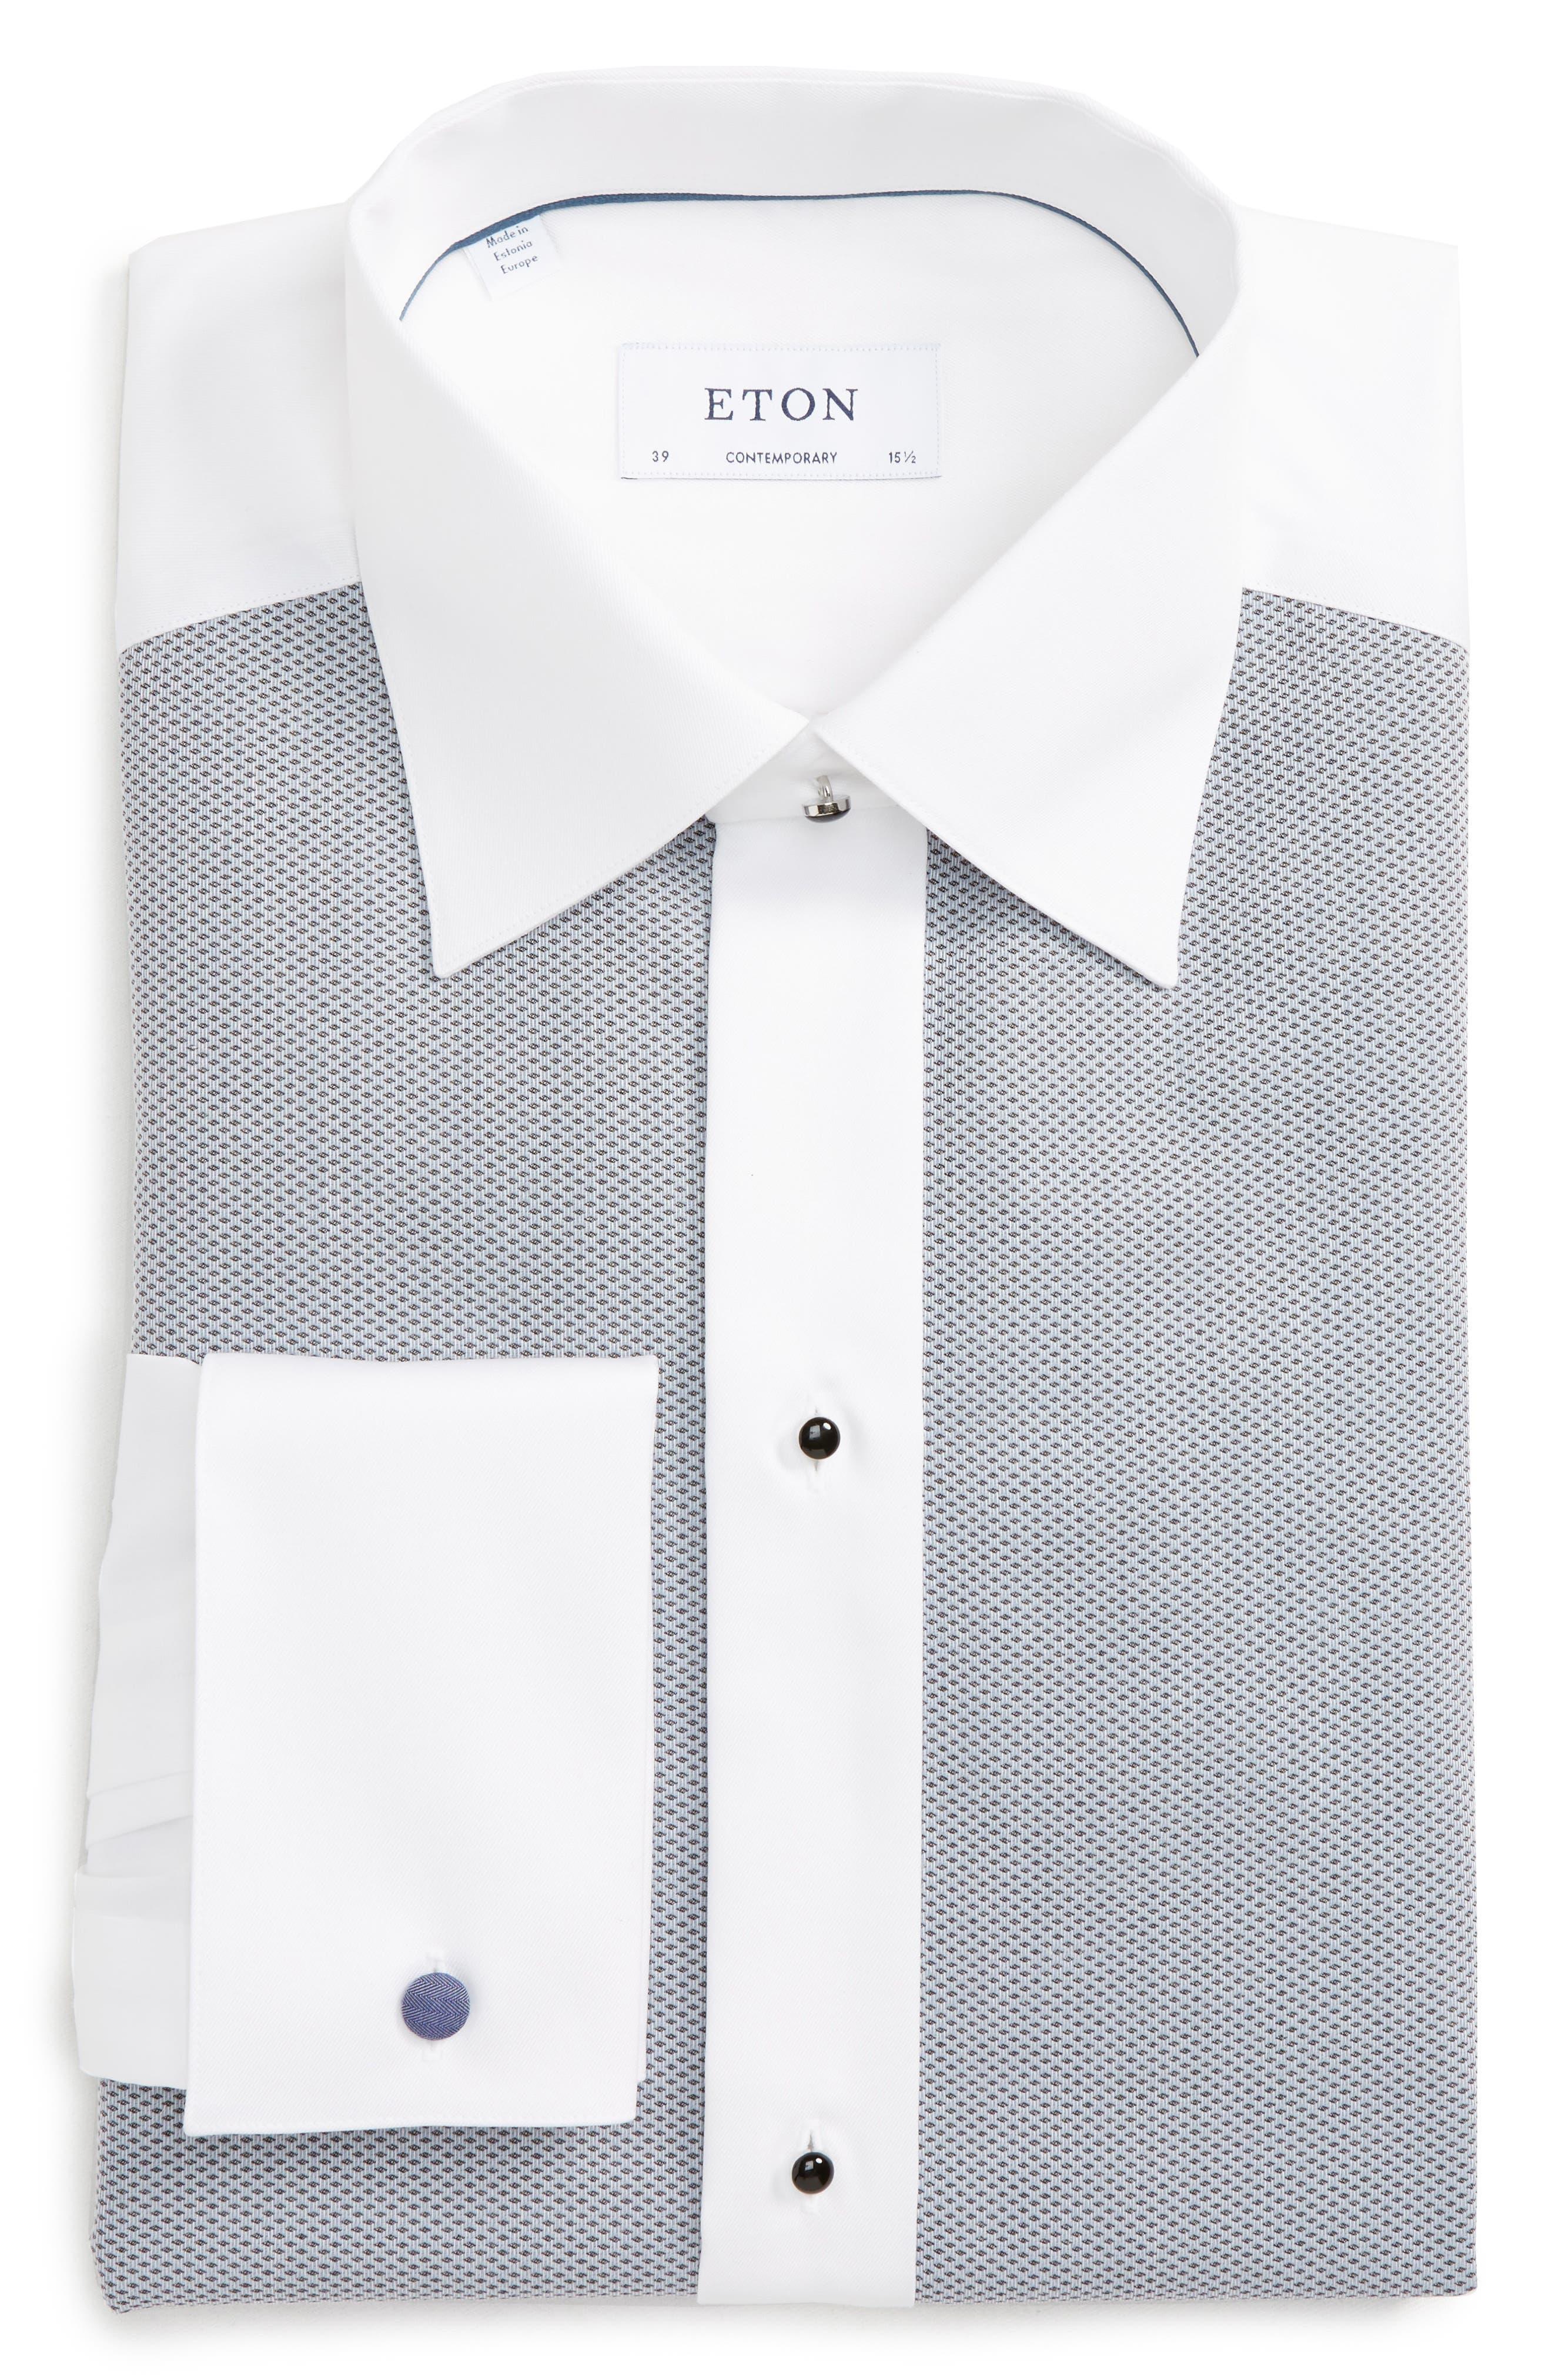 Main Image - Eton Contemporary Fit Tuxedo Shirt